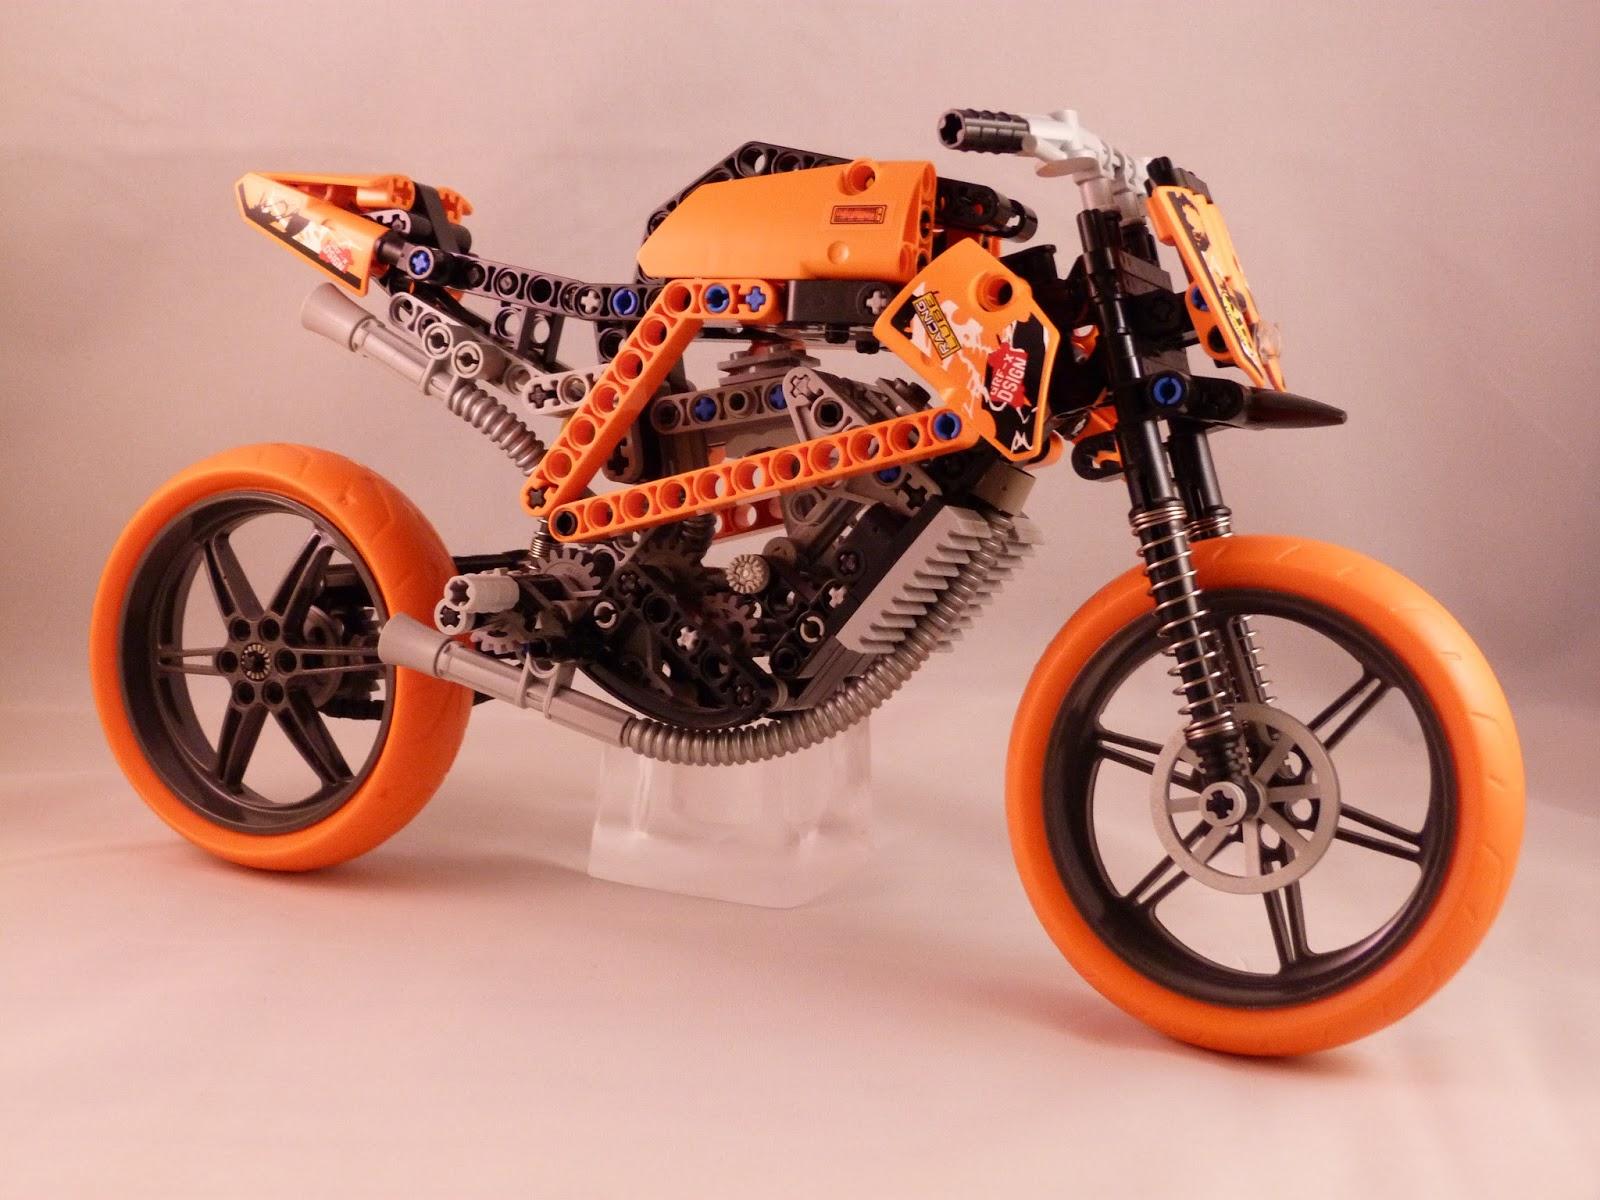 lego technic motorcycles ktm superduke r by nemmoz. Black Bedroom Furniture Sets. Home Design Ideas